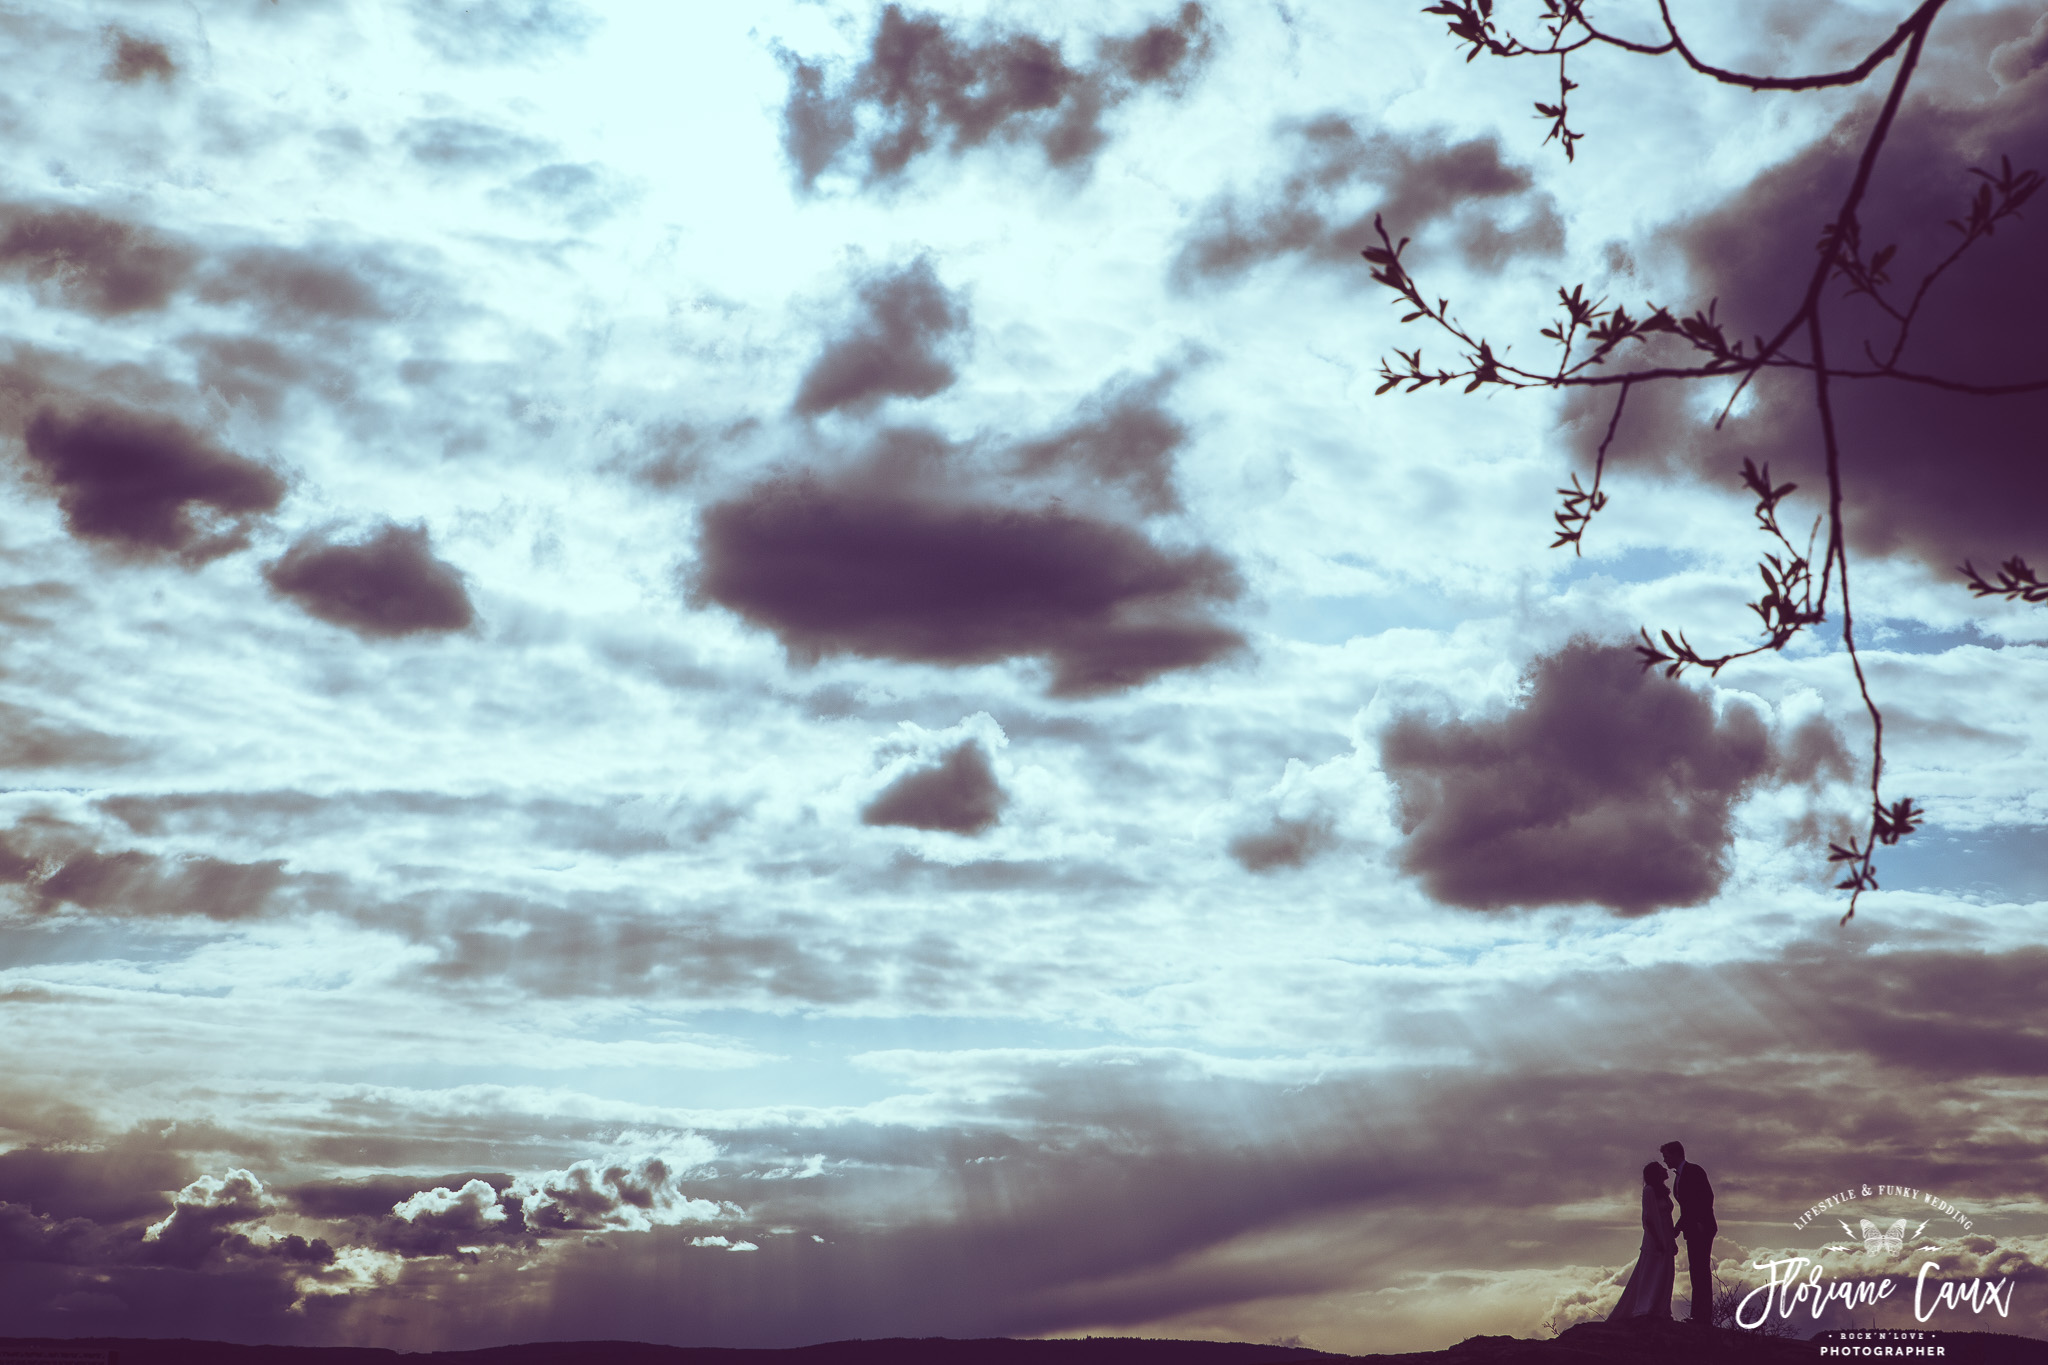 destination-wedding-photographer-oslo-norway-floriane-caux-78